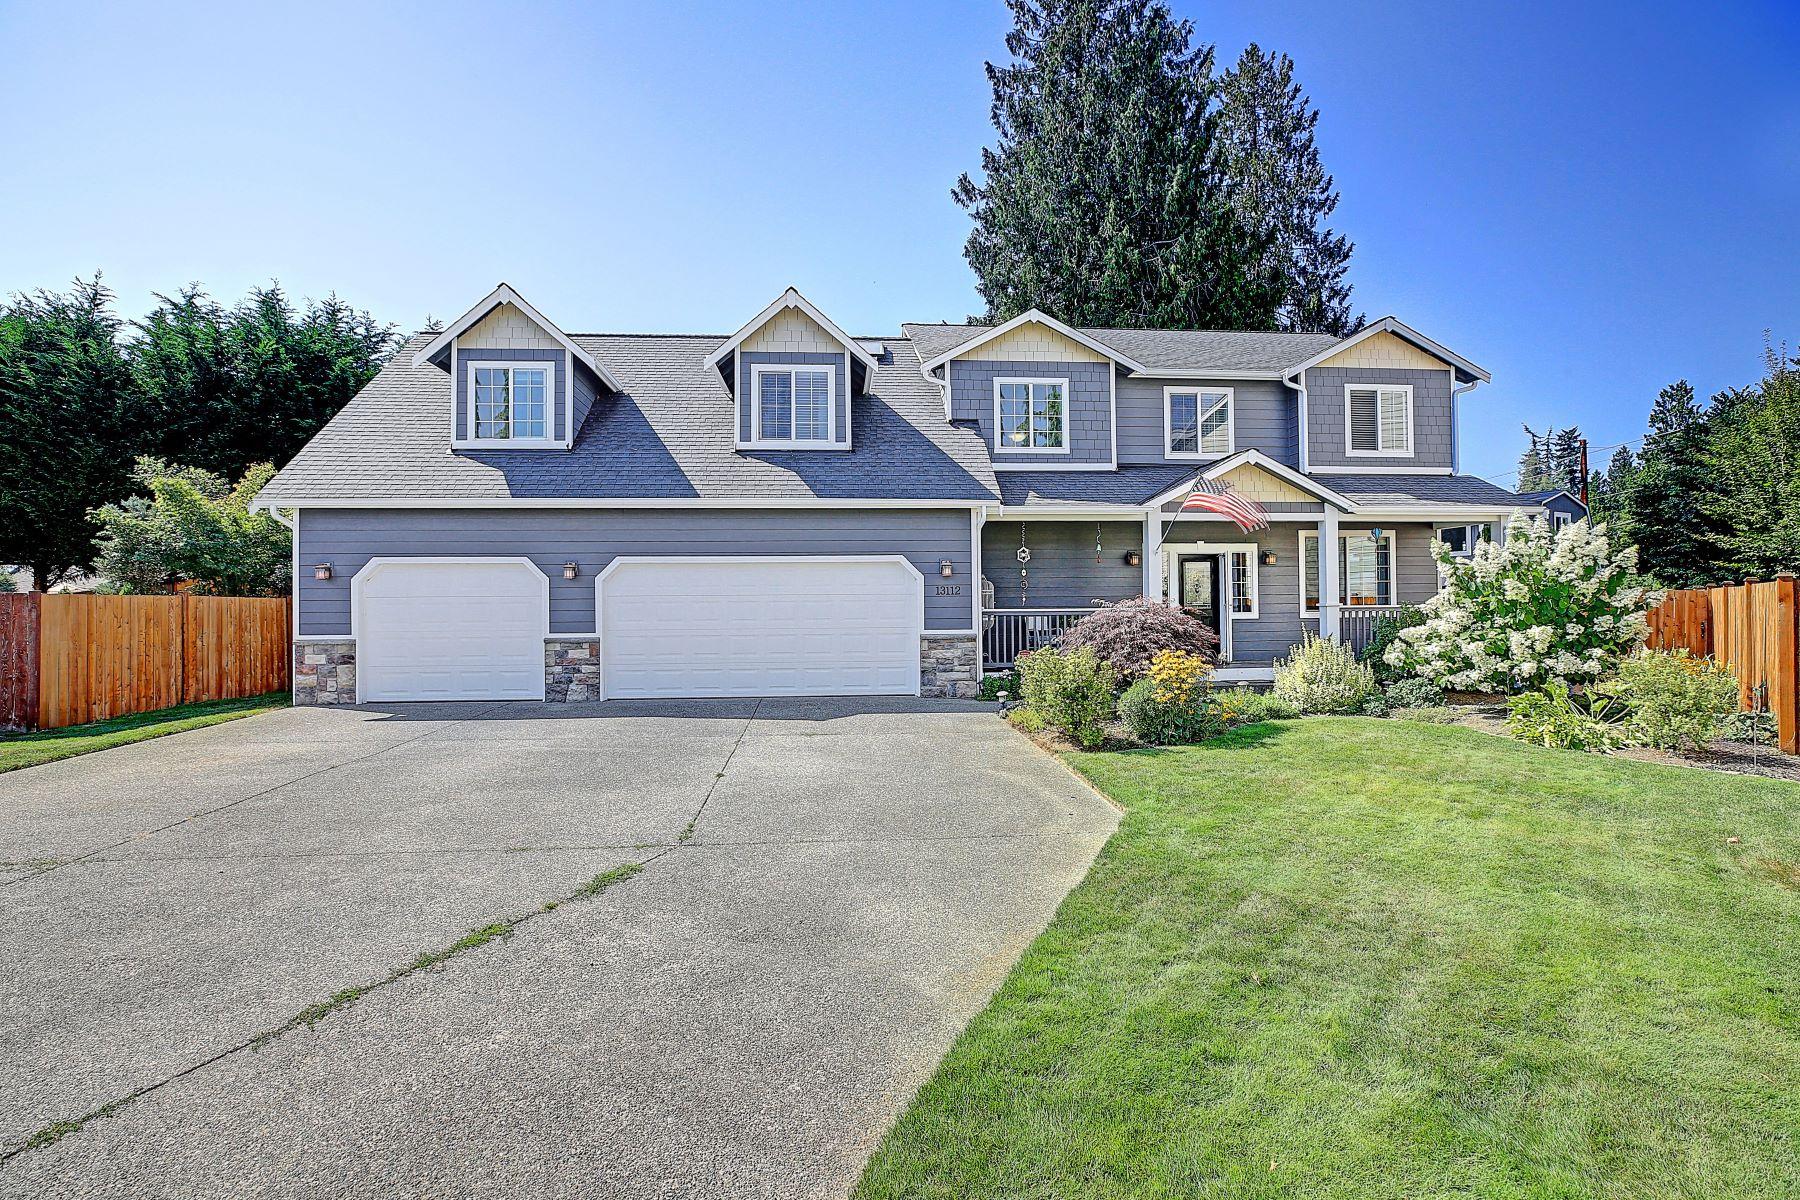 Single Family Homes por un Venta en 13112 55th Dr NE, Marysville, WA 98271 13112 55th Dr NE Marysville, Washington 98271 Estados Unidos